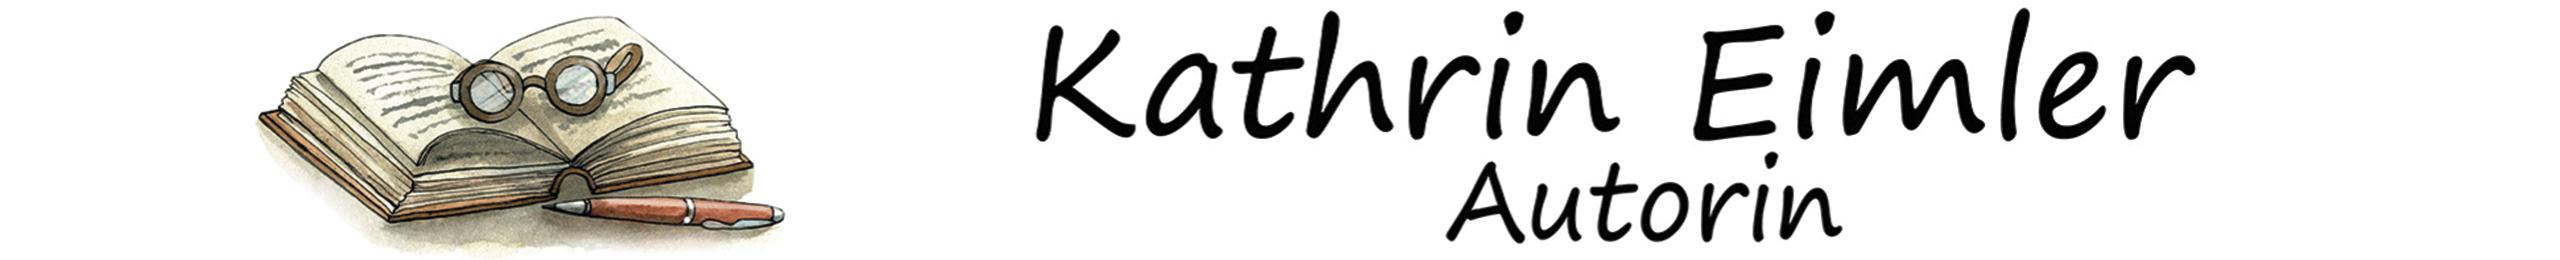 Kathrin Eimler